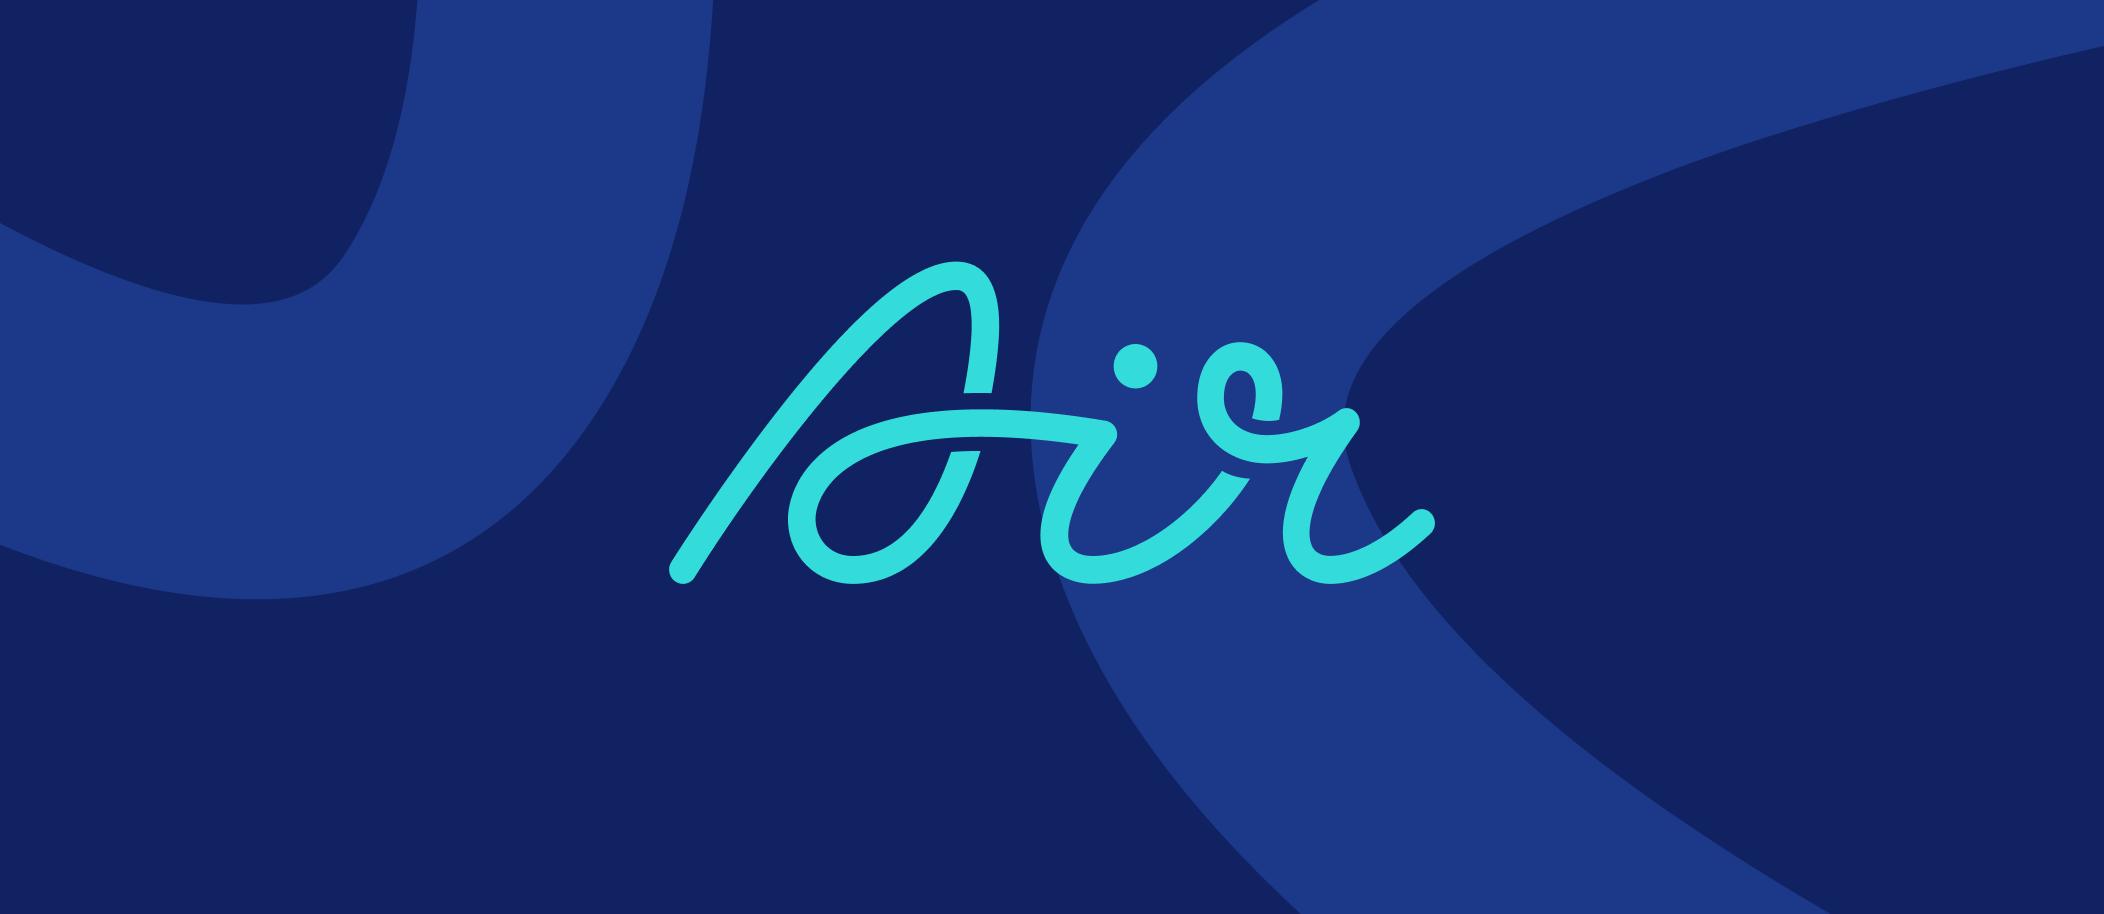 An image of Air logo